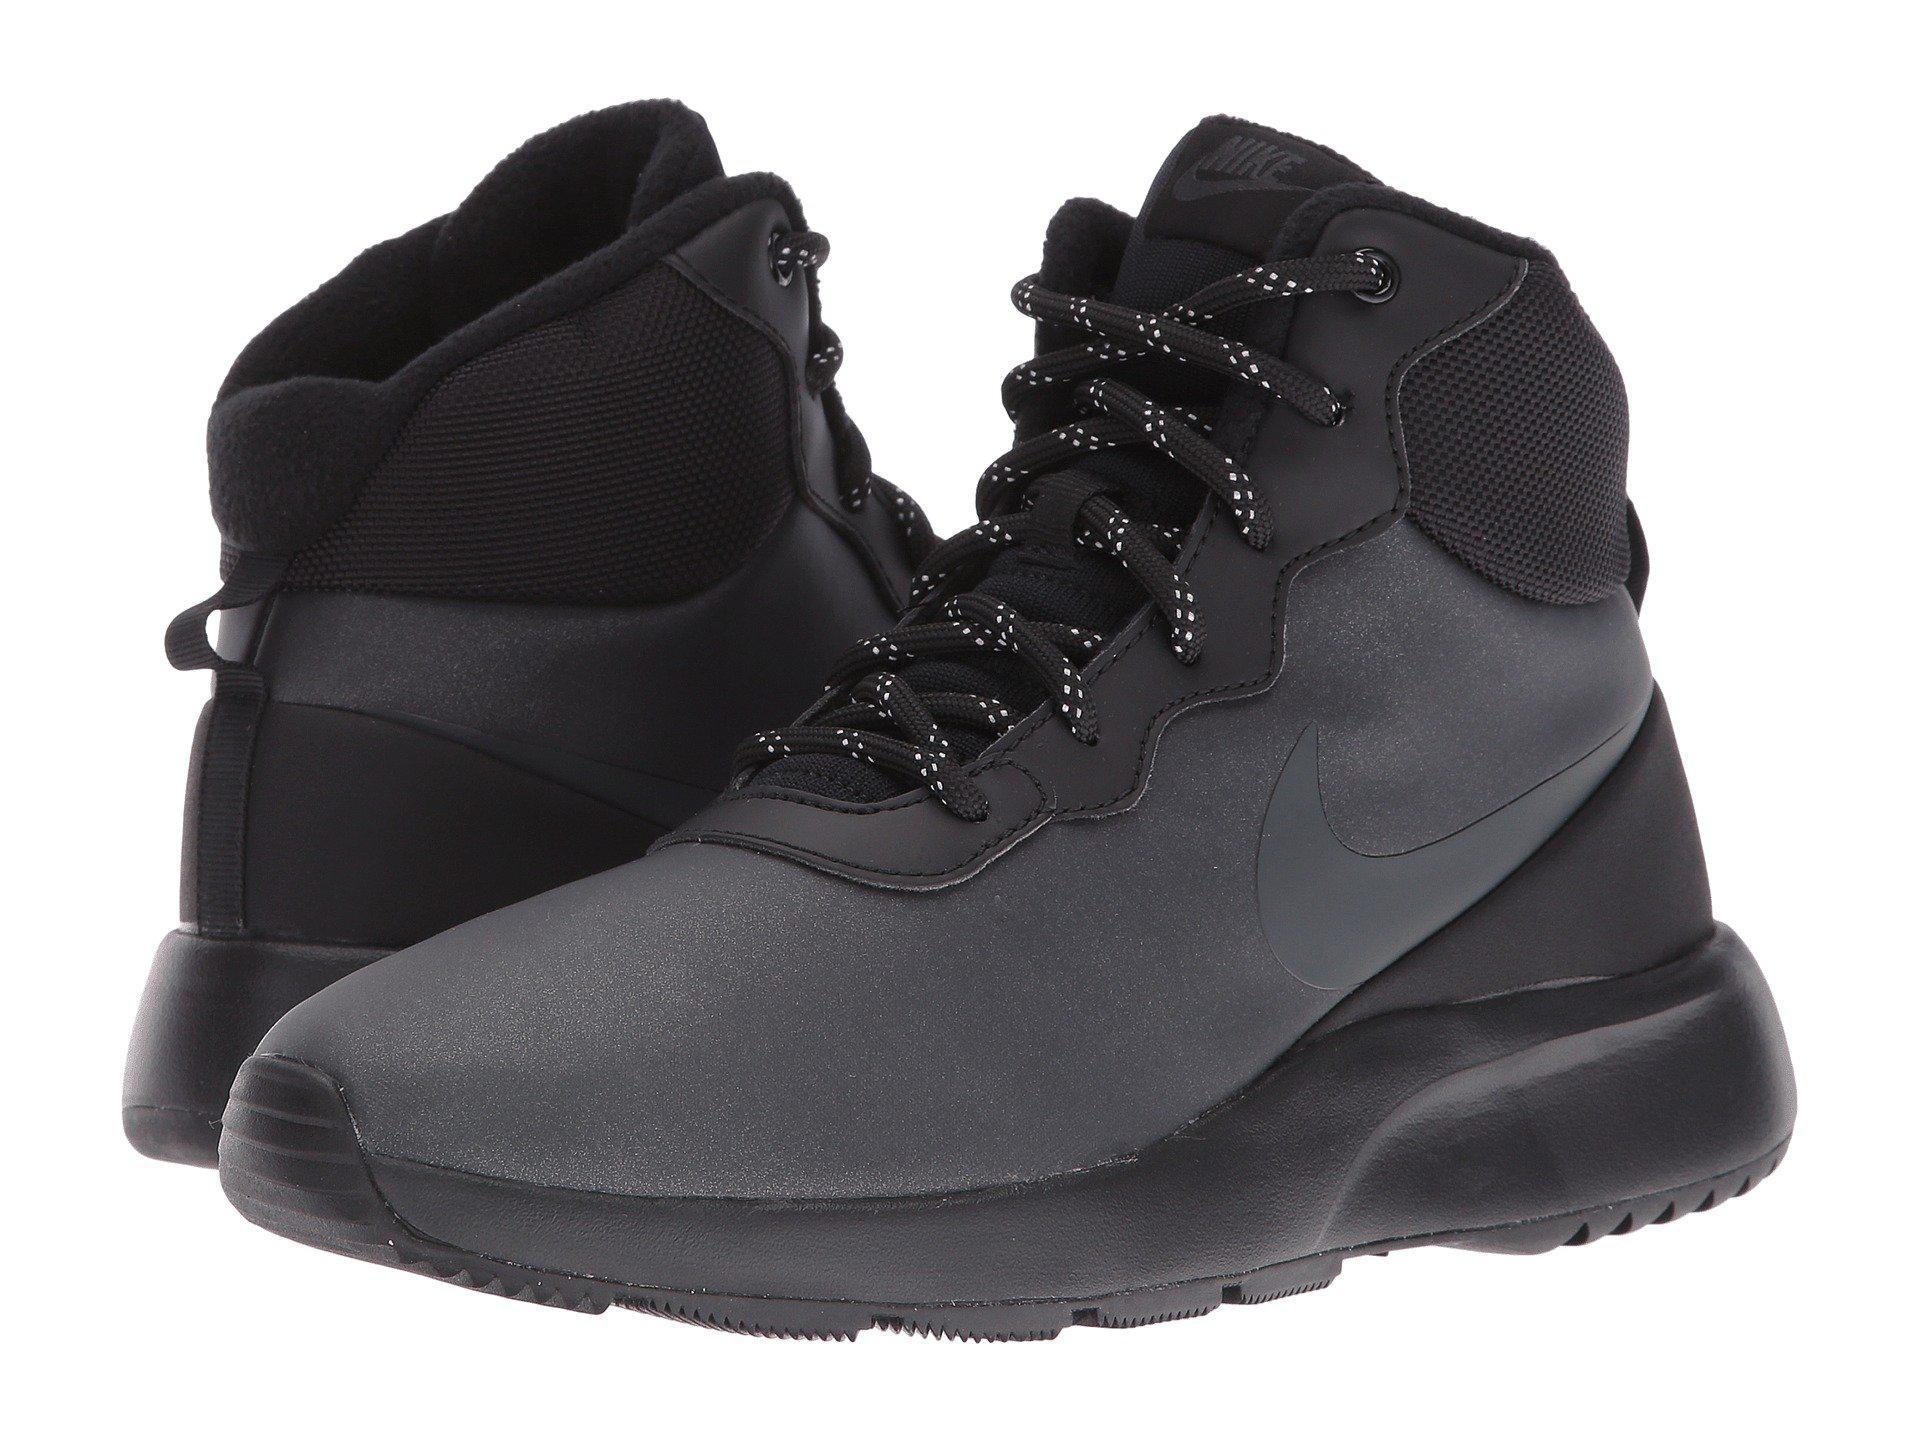 4f15adba Nike Tanjun High Winter in Black - Lyst